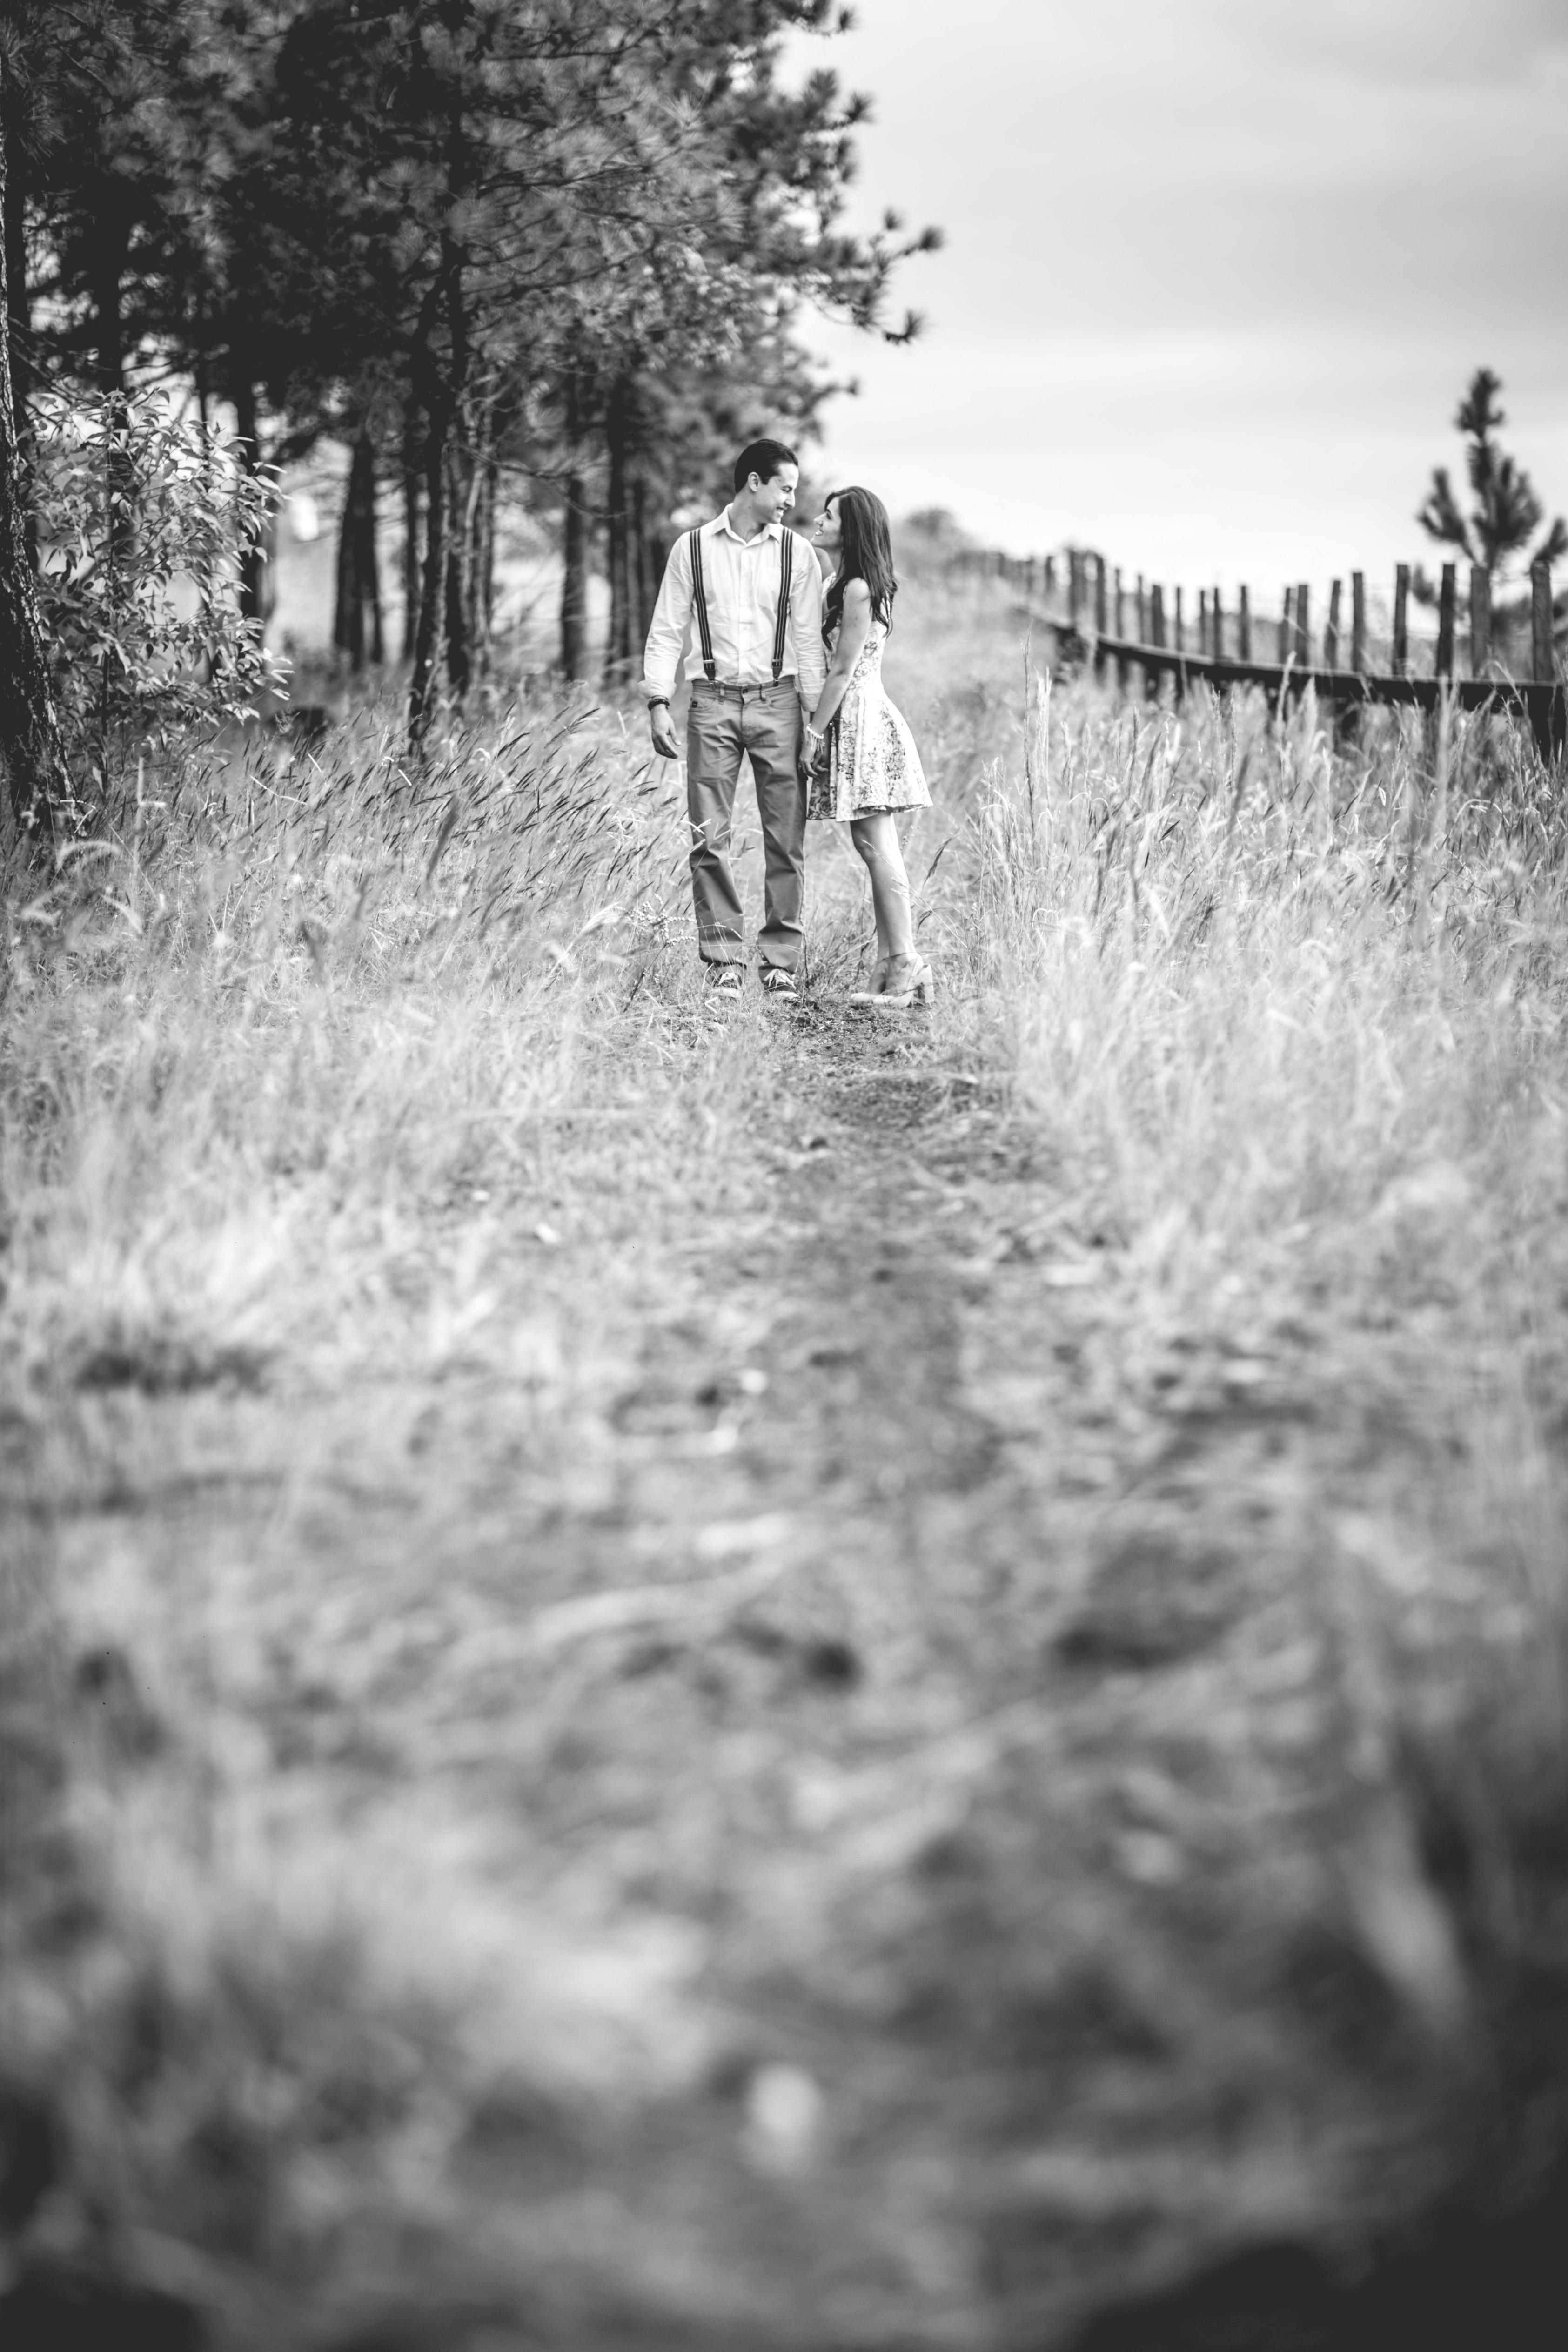 Landscape nature snow winter black and white photography love romantic monochrome season photograph couple in love